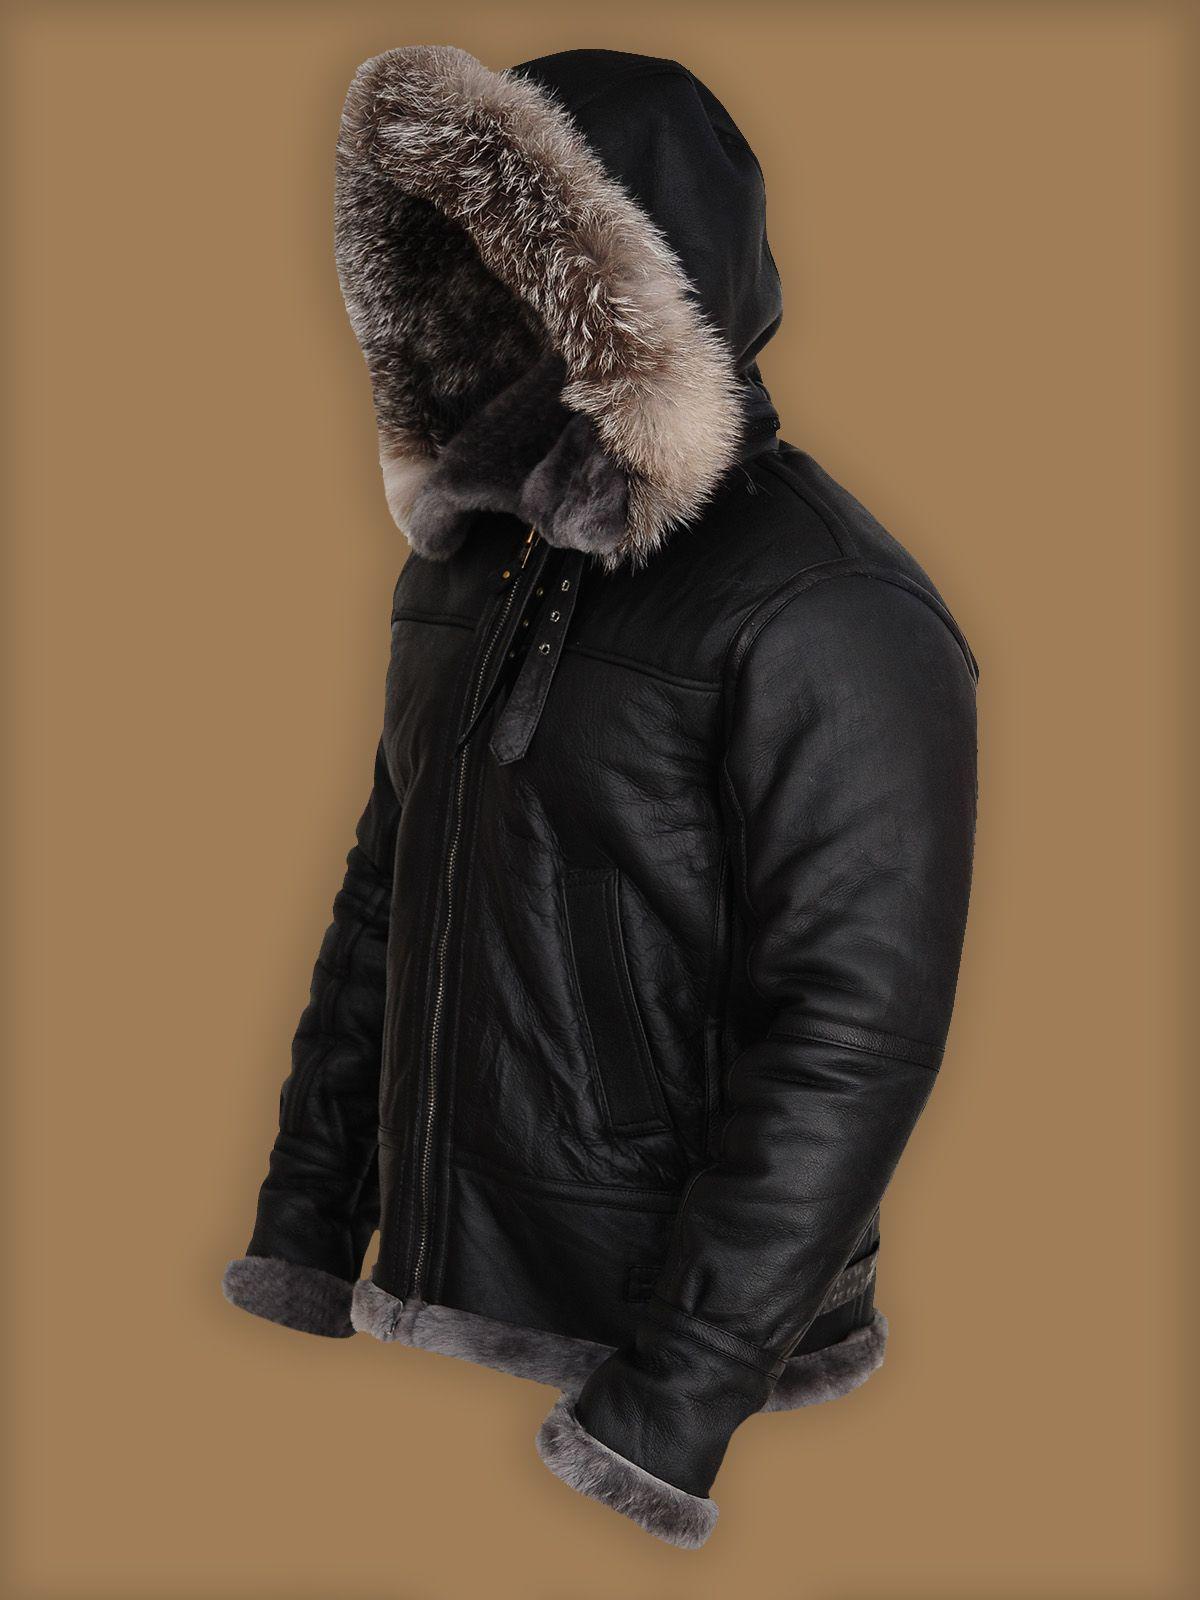 Men Black Shearling Jacket With Hoodie Men Jacket Mauvetree Black Shearling Jacket Shearling Jacket Vintage Leather Jacket [ 1600 x 1200 Pixel ]